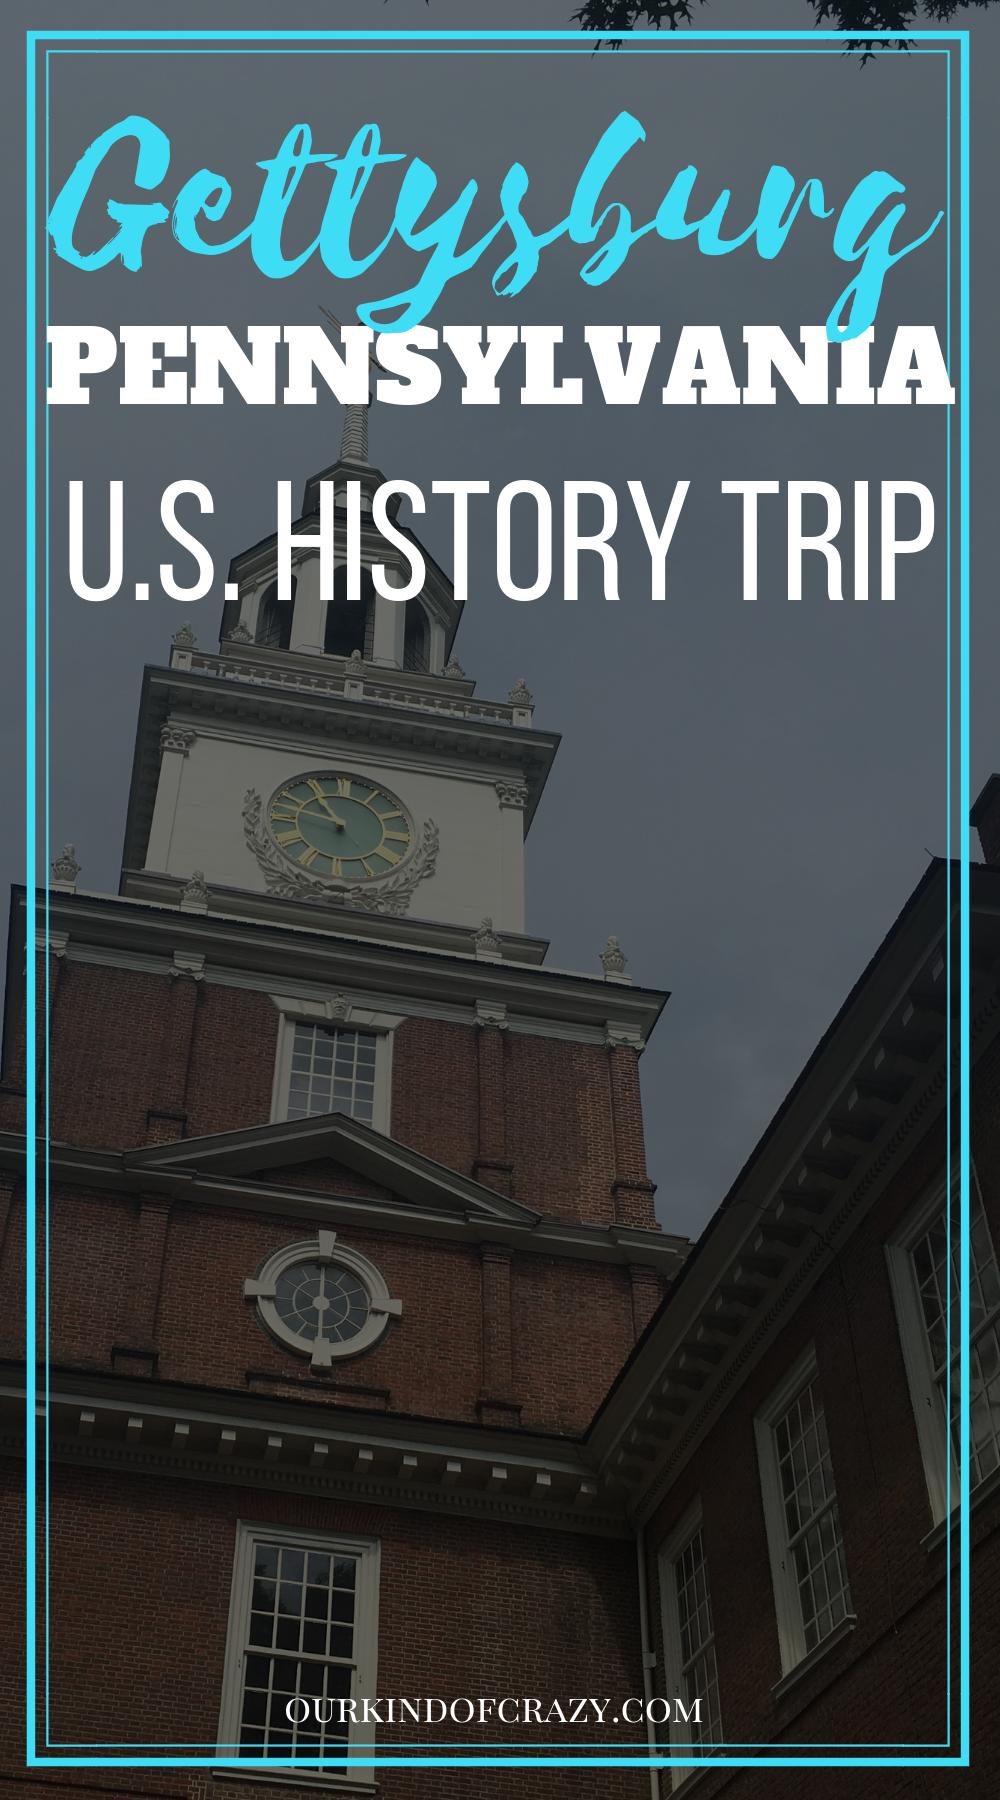 US History Tour of Gettysburg and Philadelphia - What to do in Gettysburg, What to do in Philly, Things to do in Philadelphia and Gettysburg